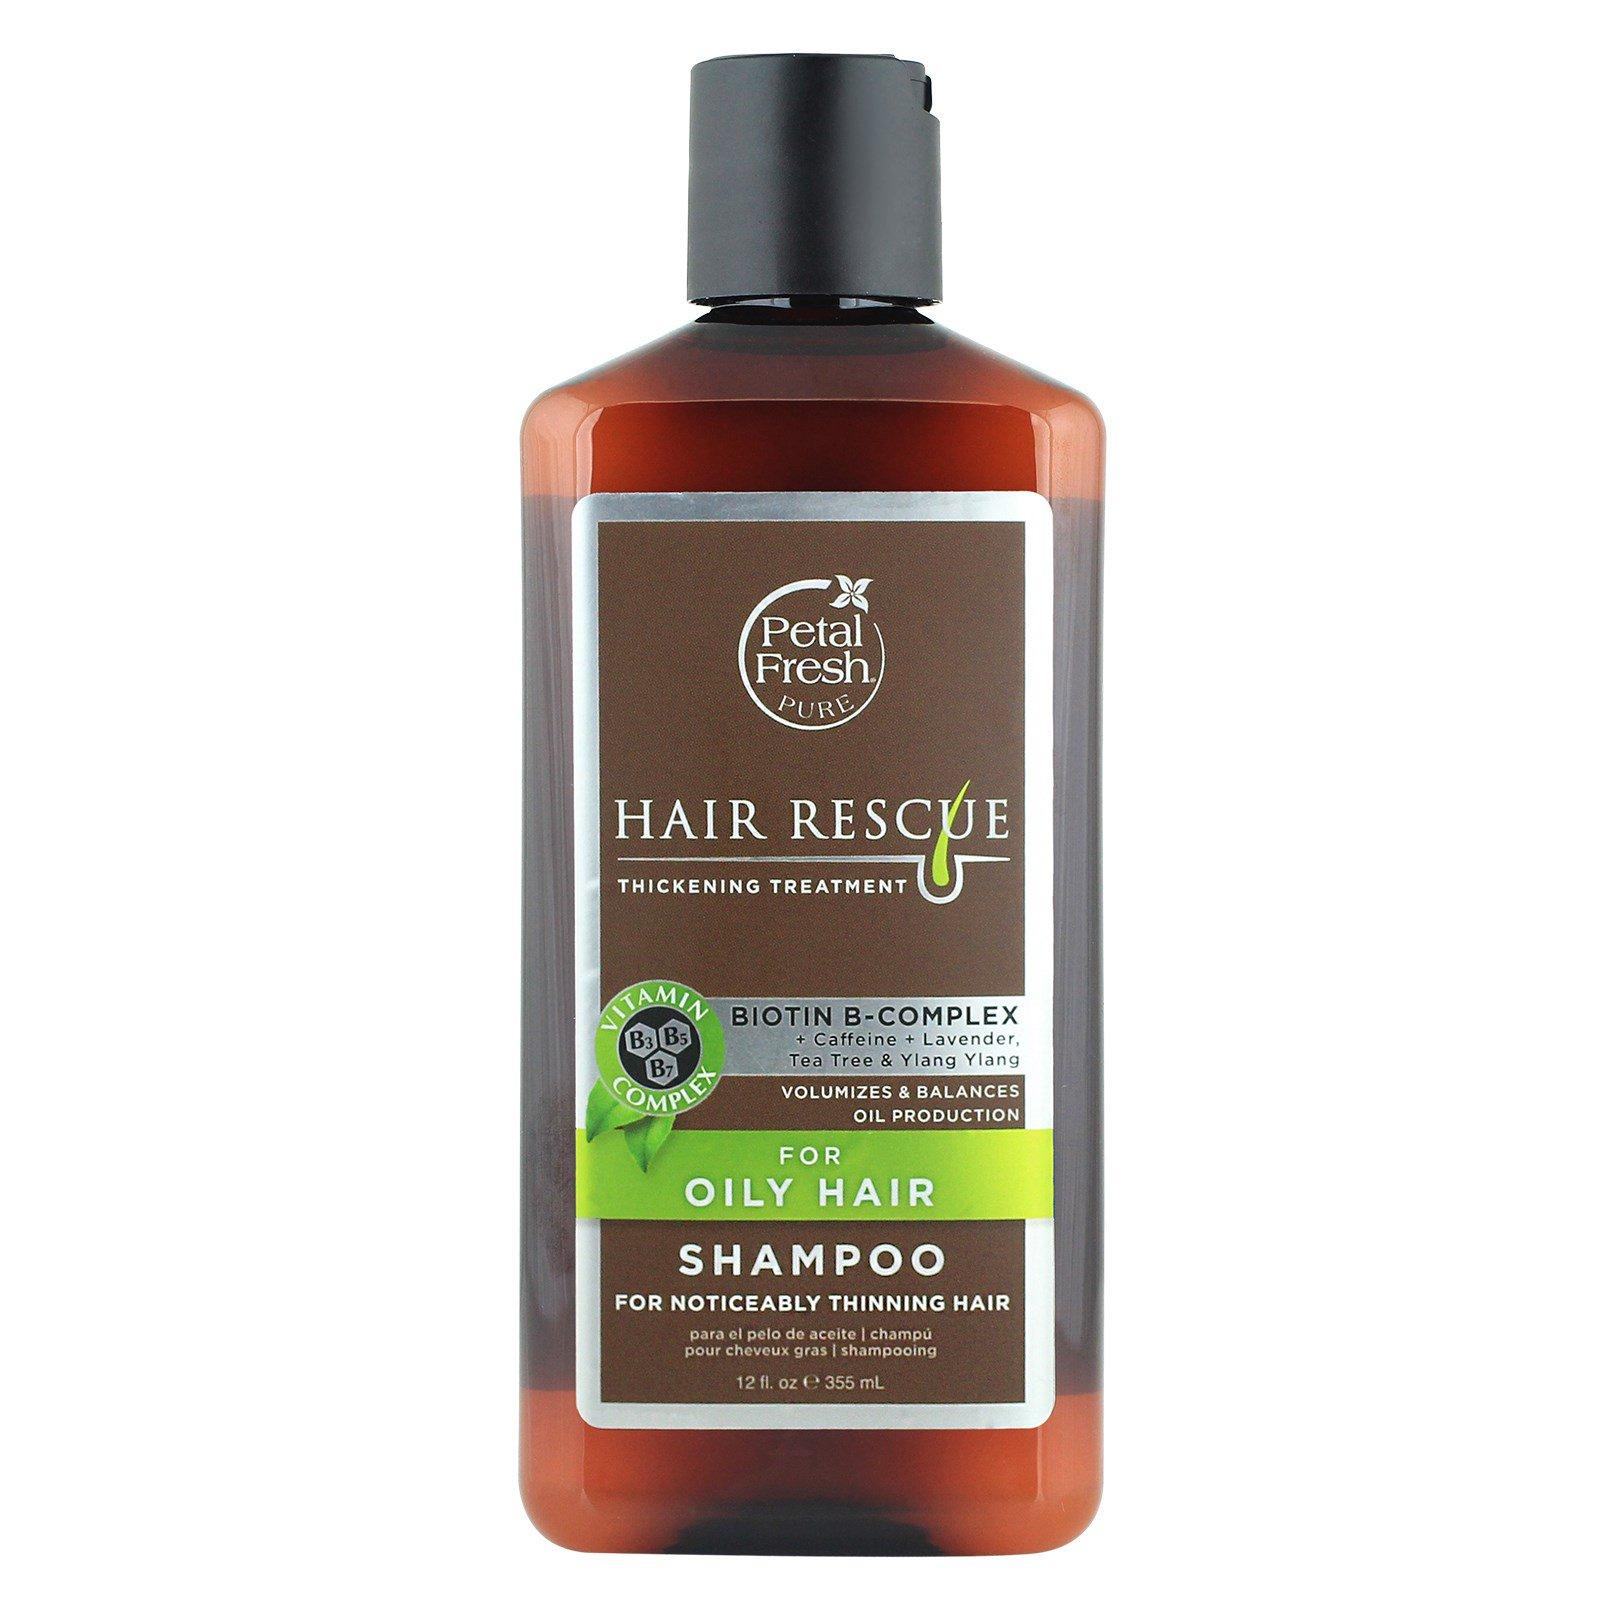 petal fresh pure hair rescue thickening treatment shampoo for